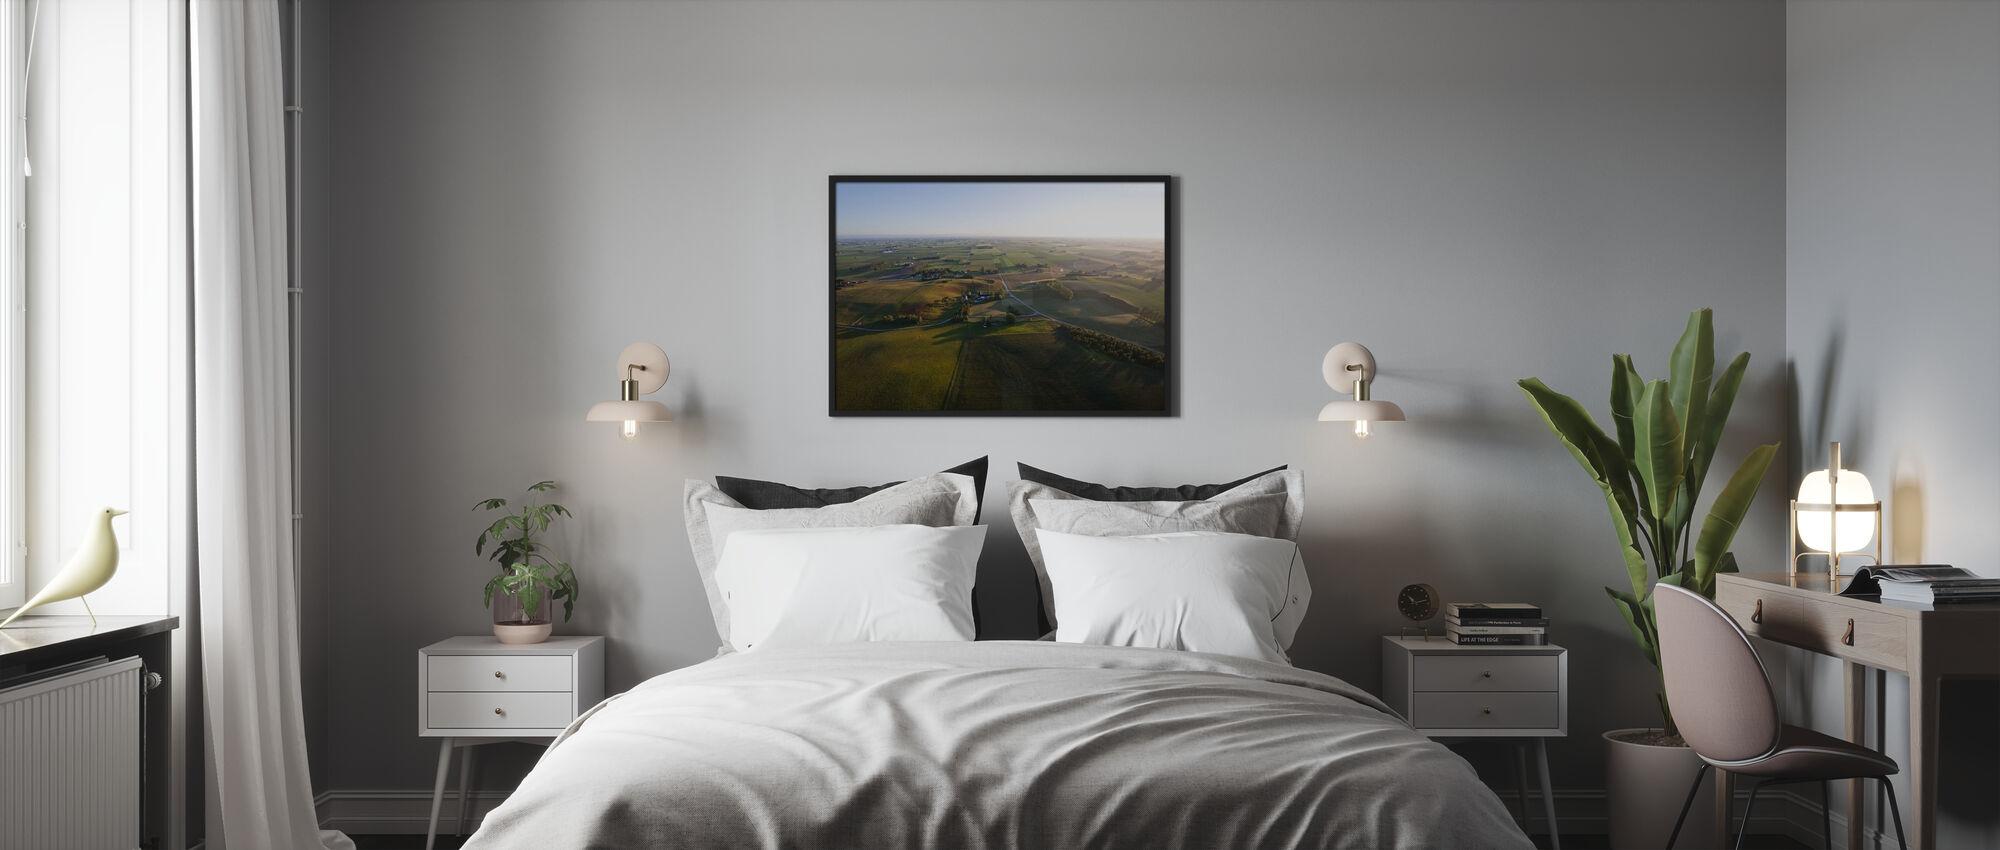 Aerial View of Skåne Countryside, Sweden - Poster - Bedroom